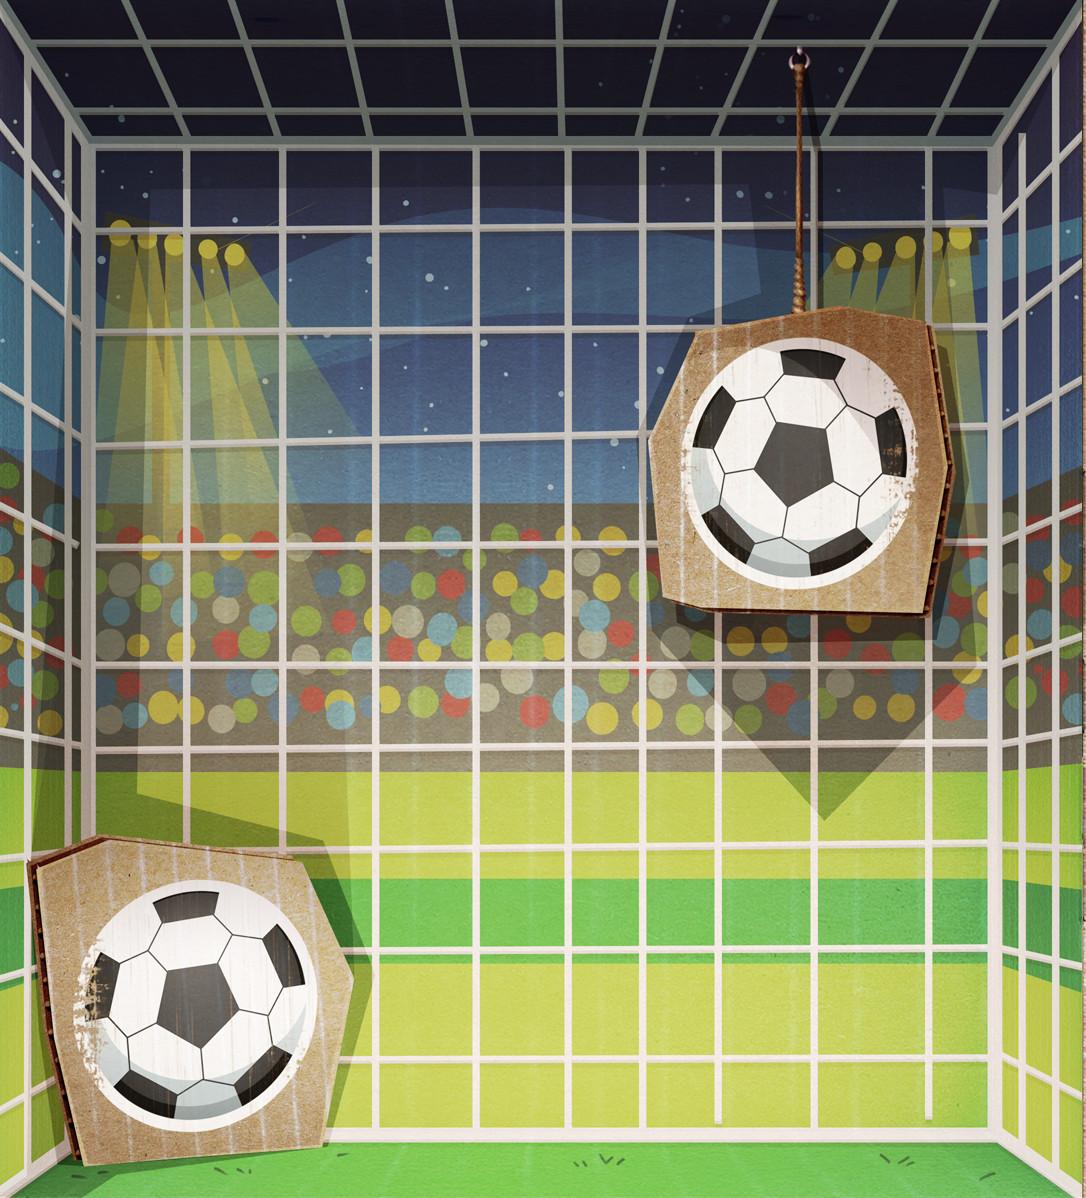 Marie bonhoure football stadiumv2